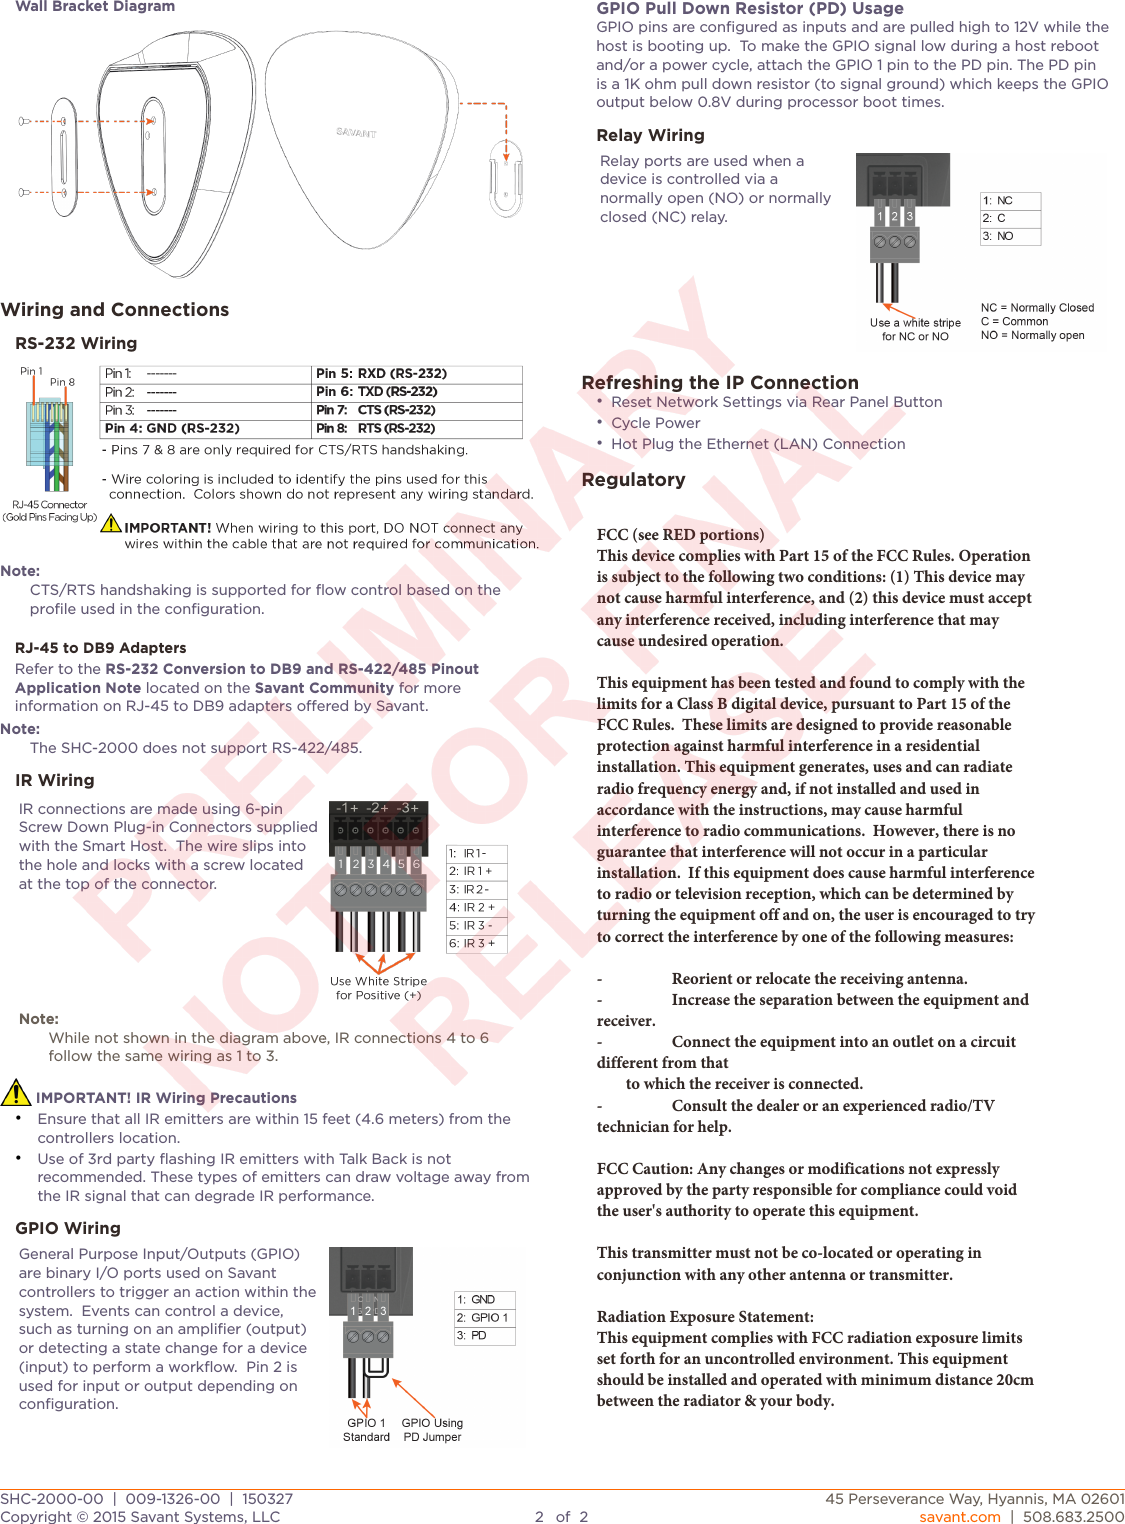 Savant Systems SHC2000 Smart Host Controller User Manual 009 1326 00